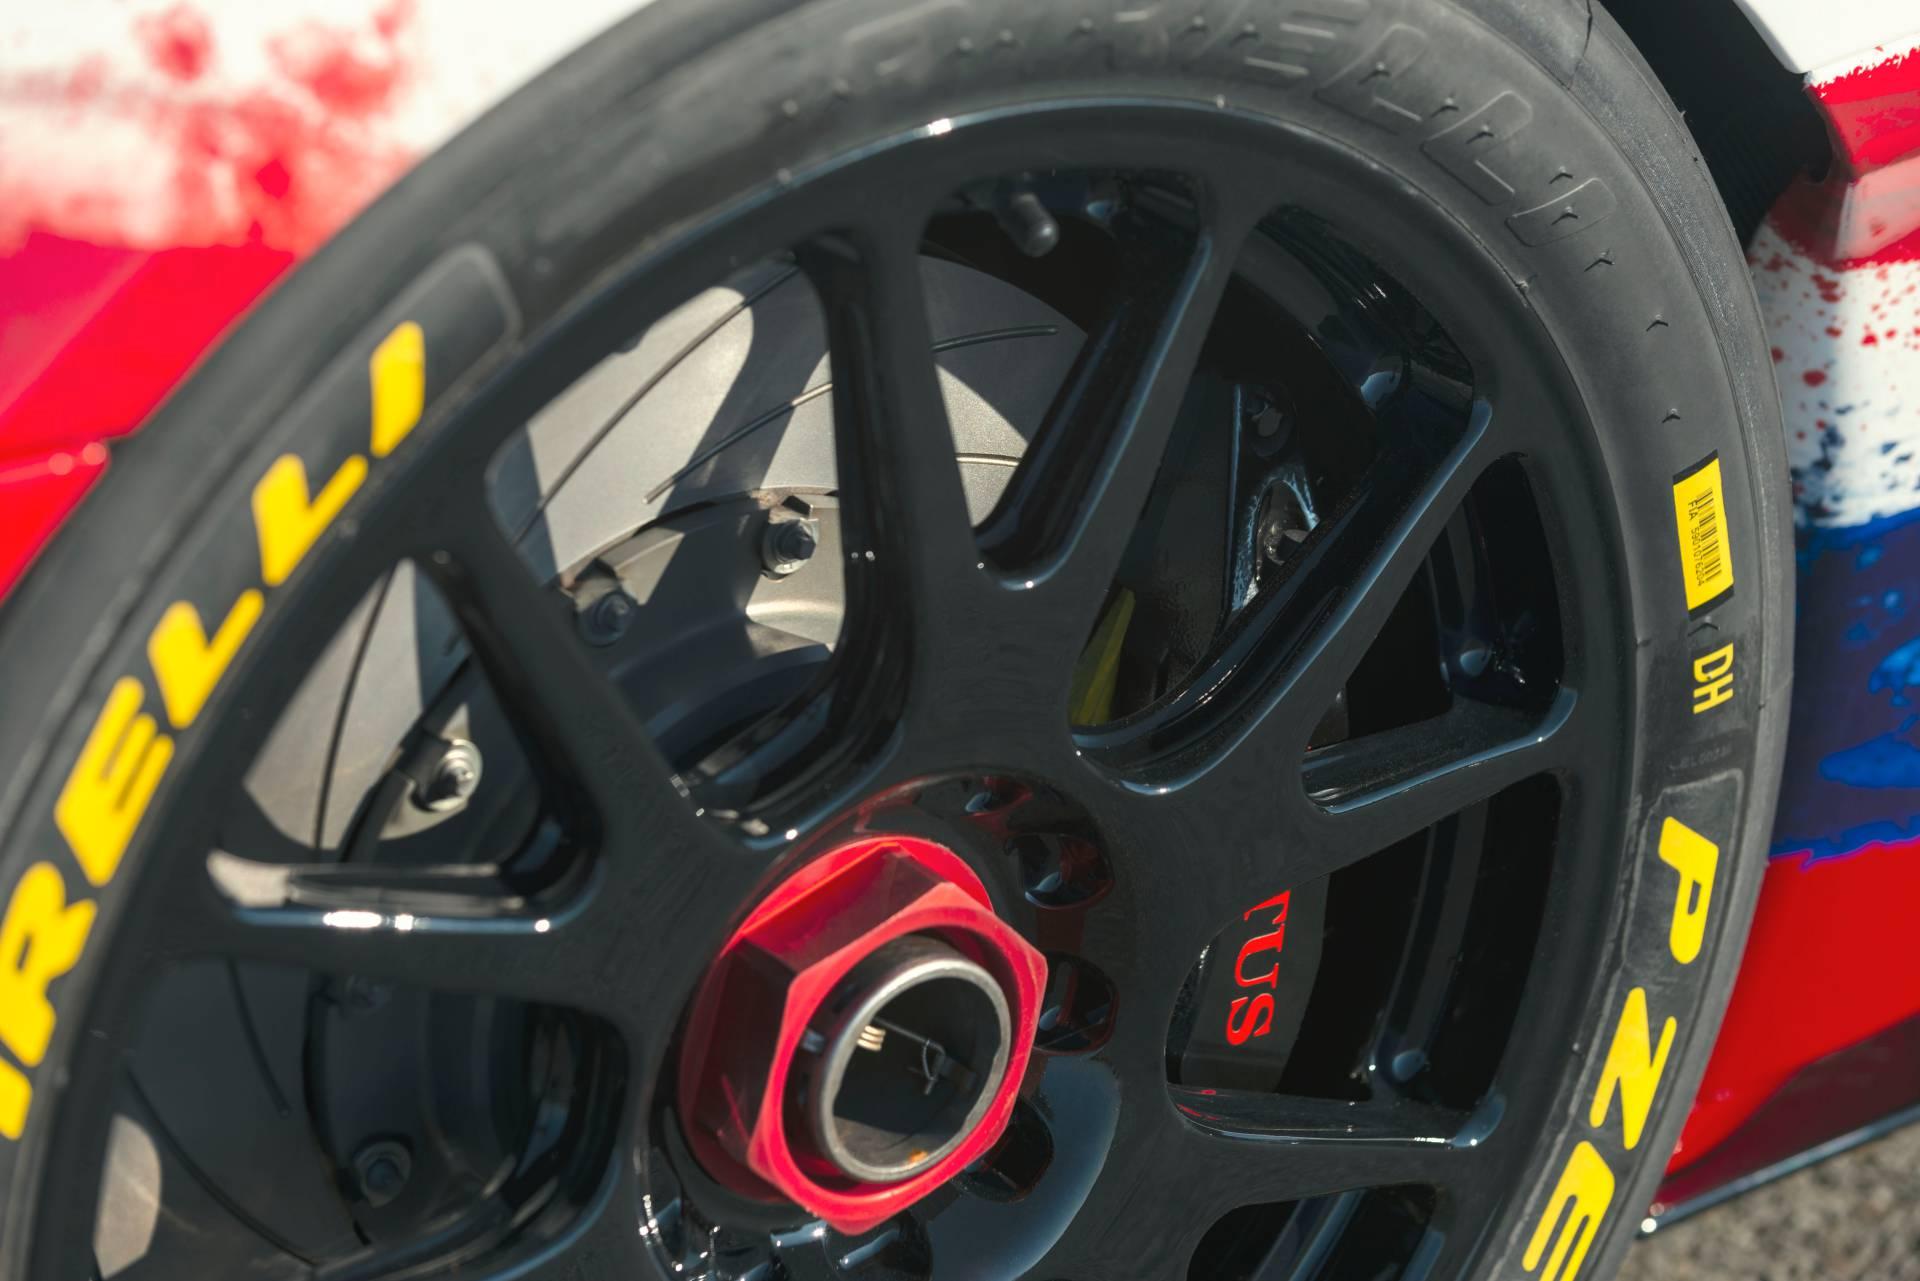 Lotus-Evora-GT4-Concept-14